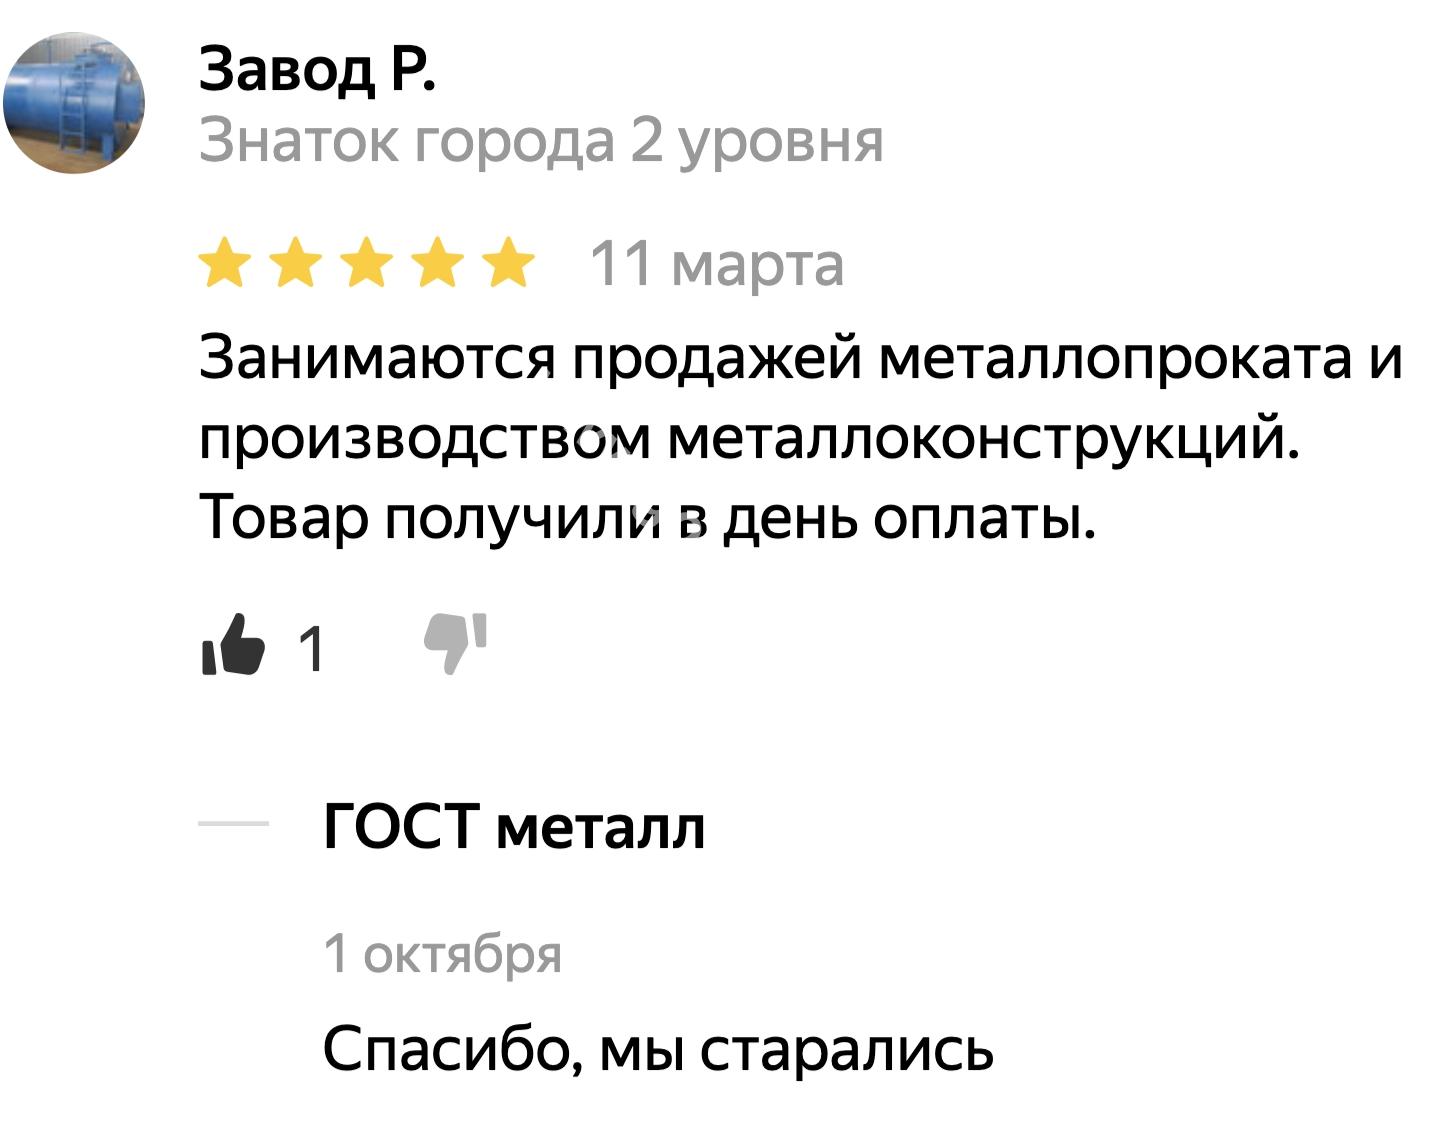 Поставка металлопроката в Москве от ГОСТ Металл отзывы